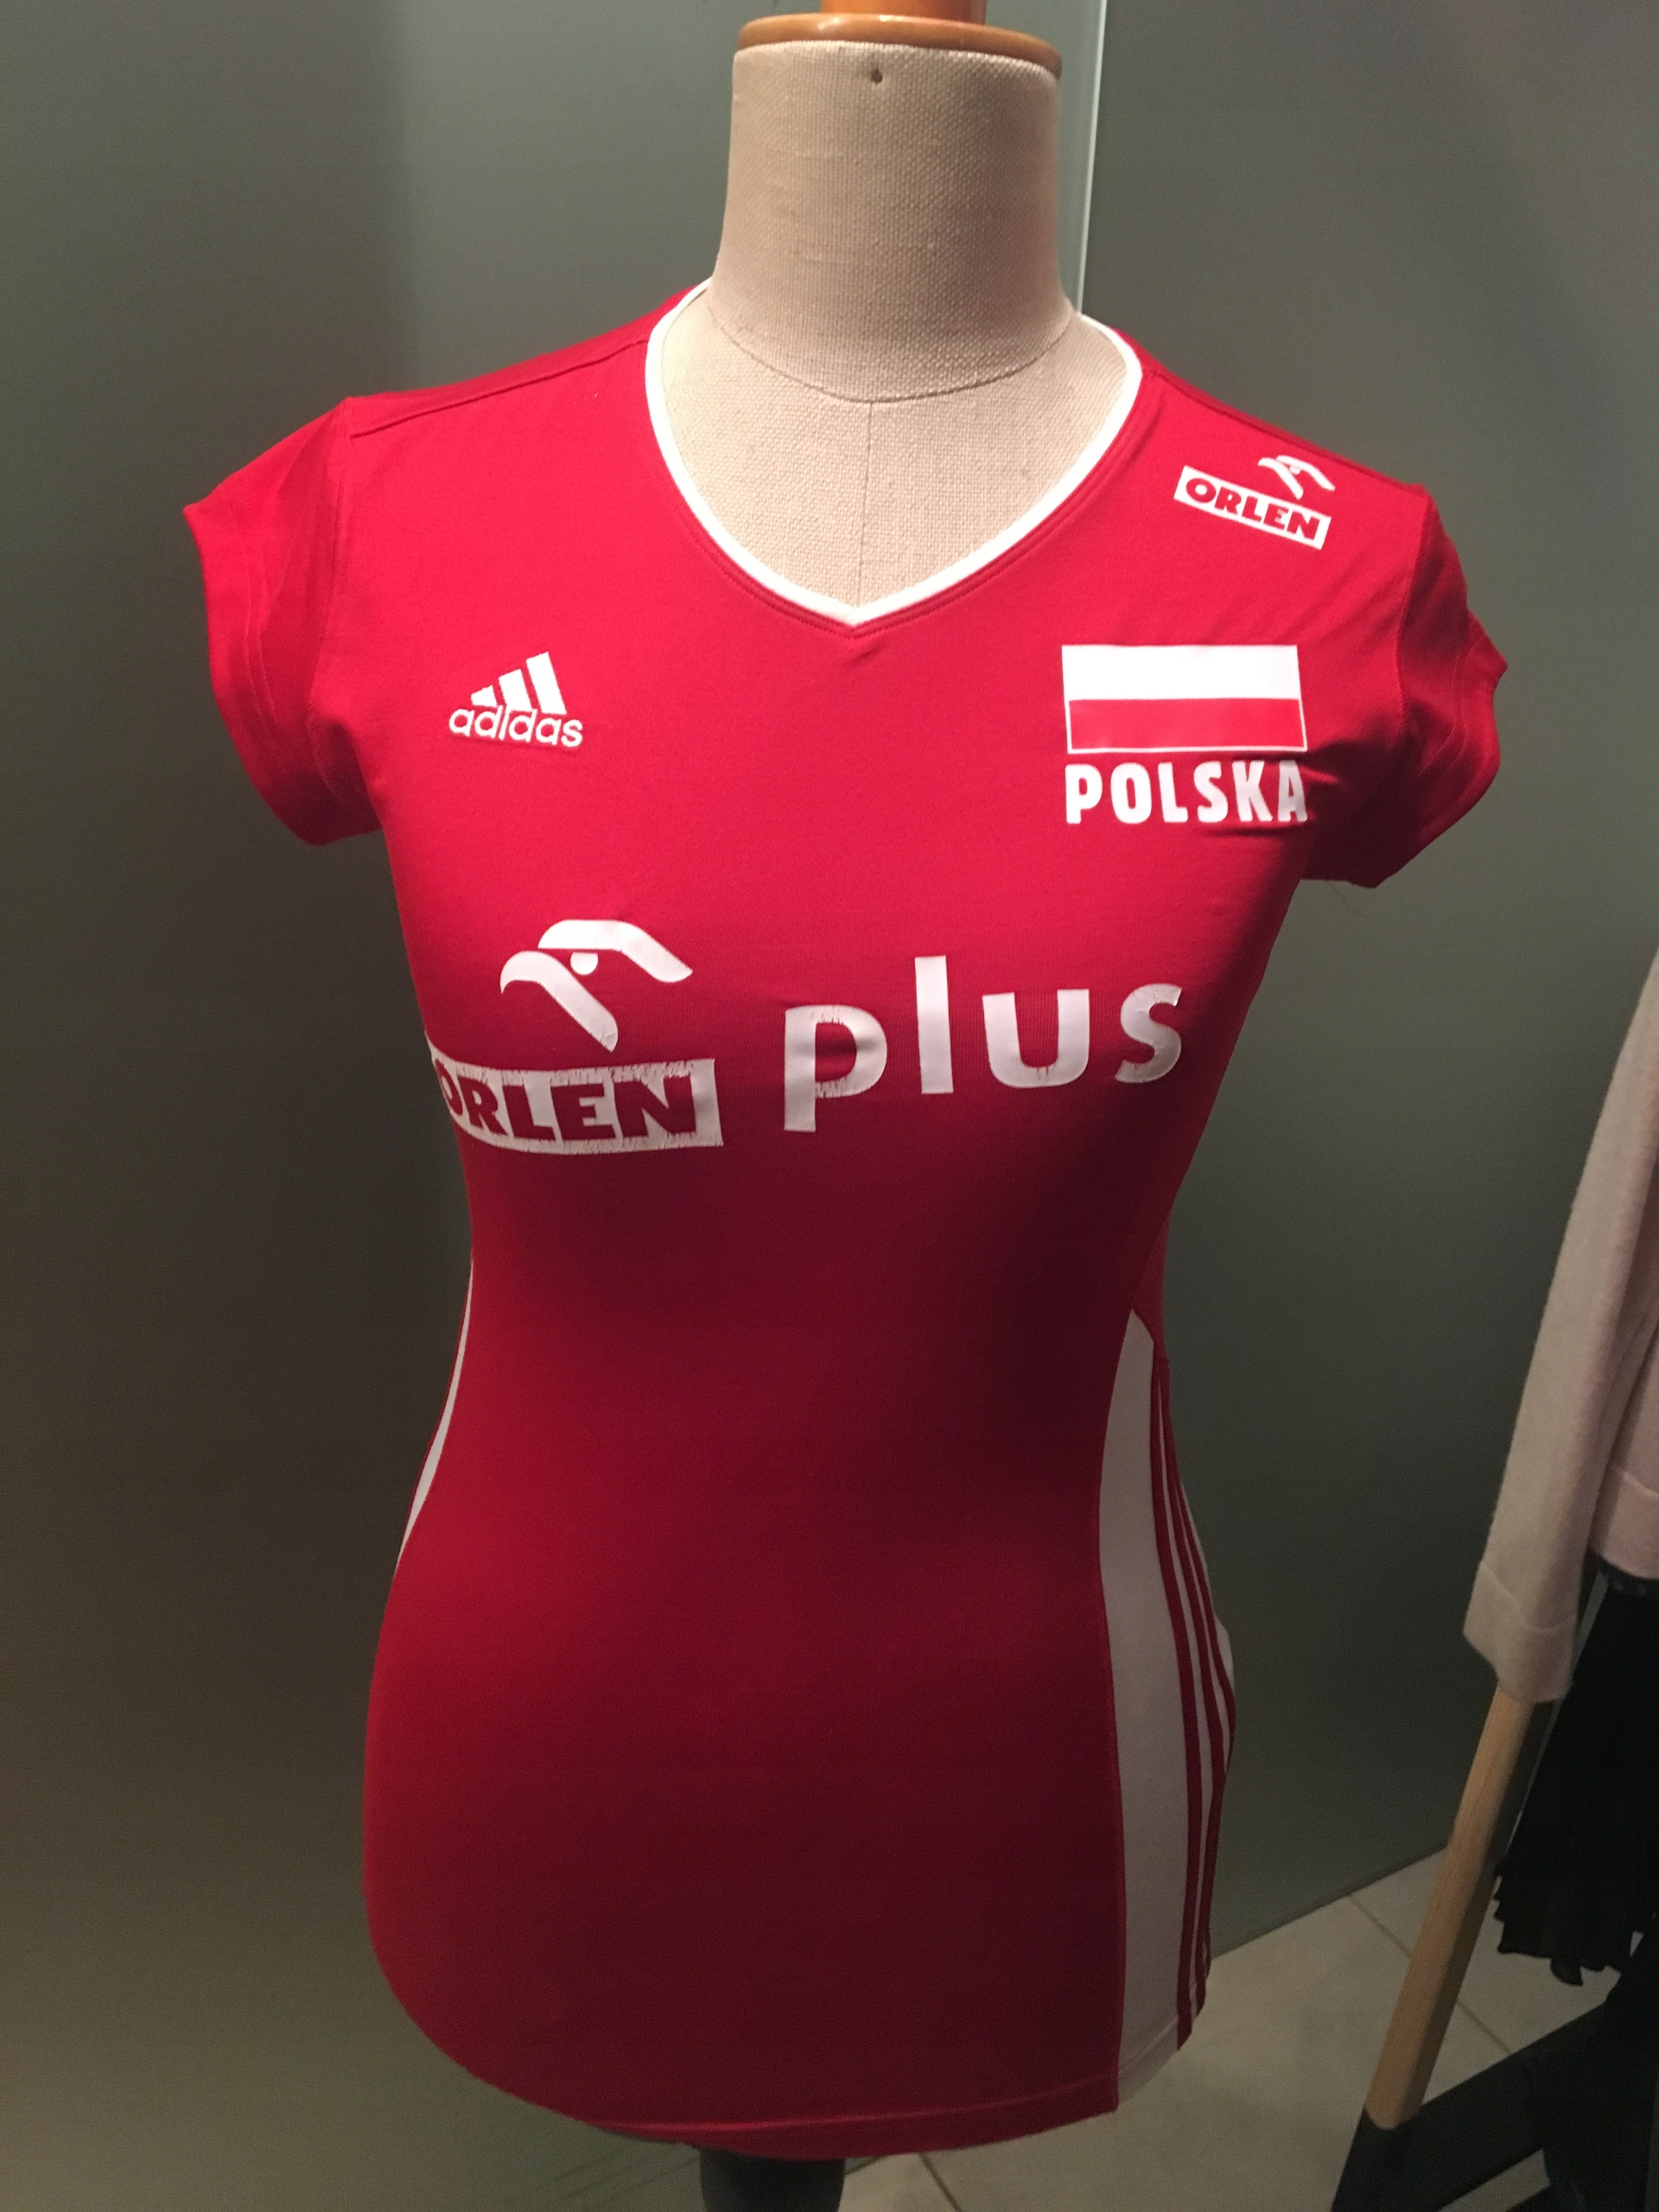 koszulka damska adidas s czerwona